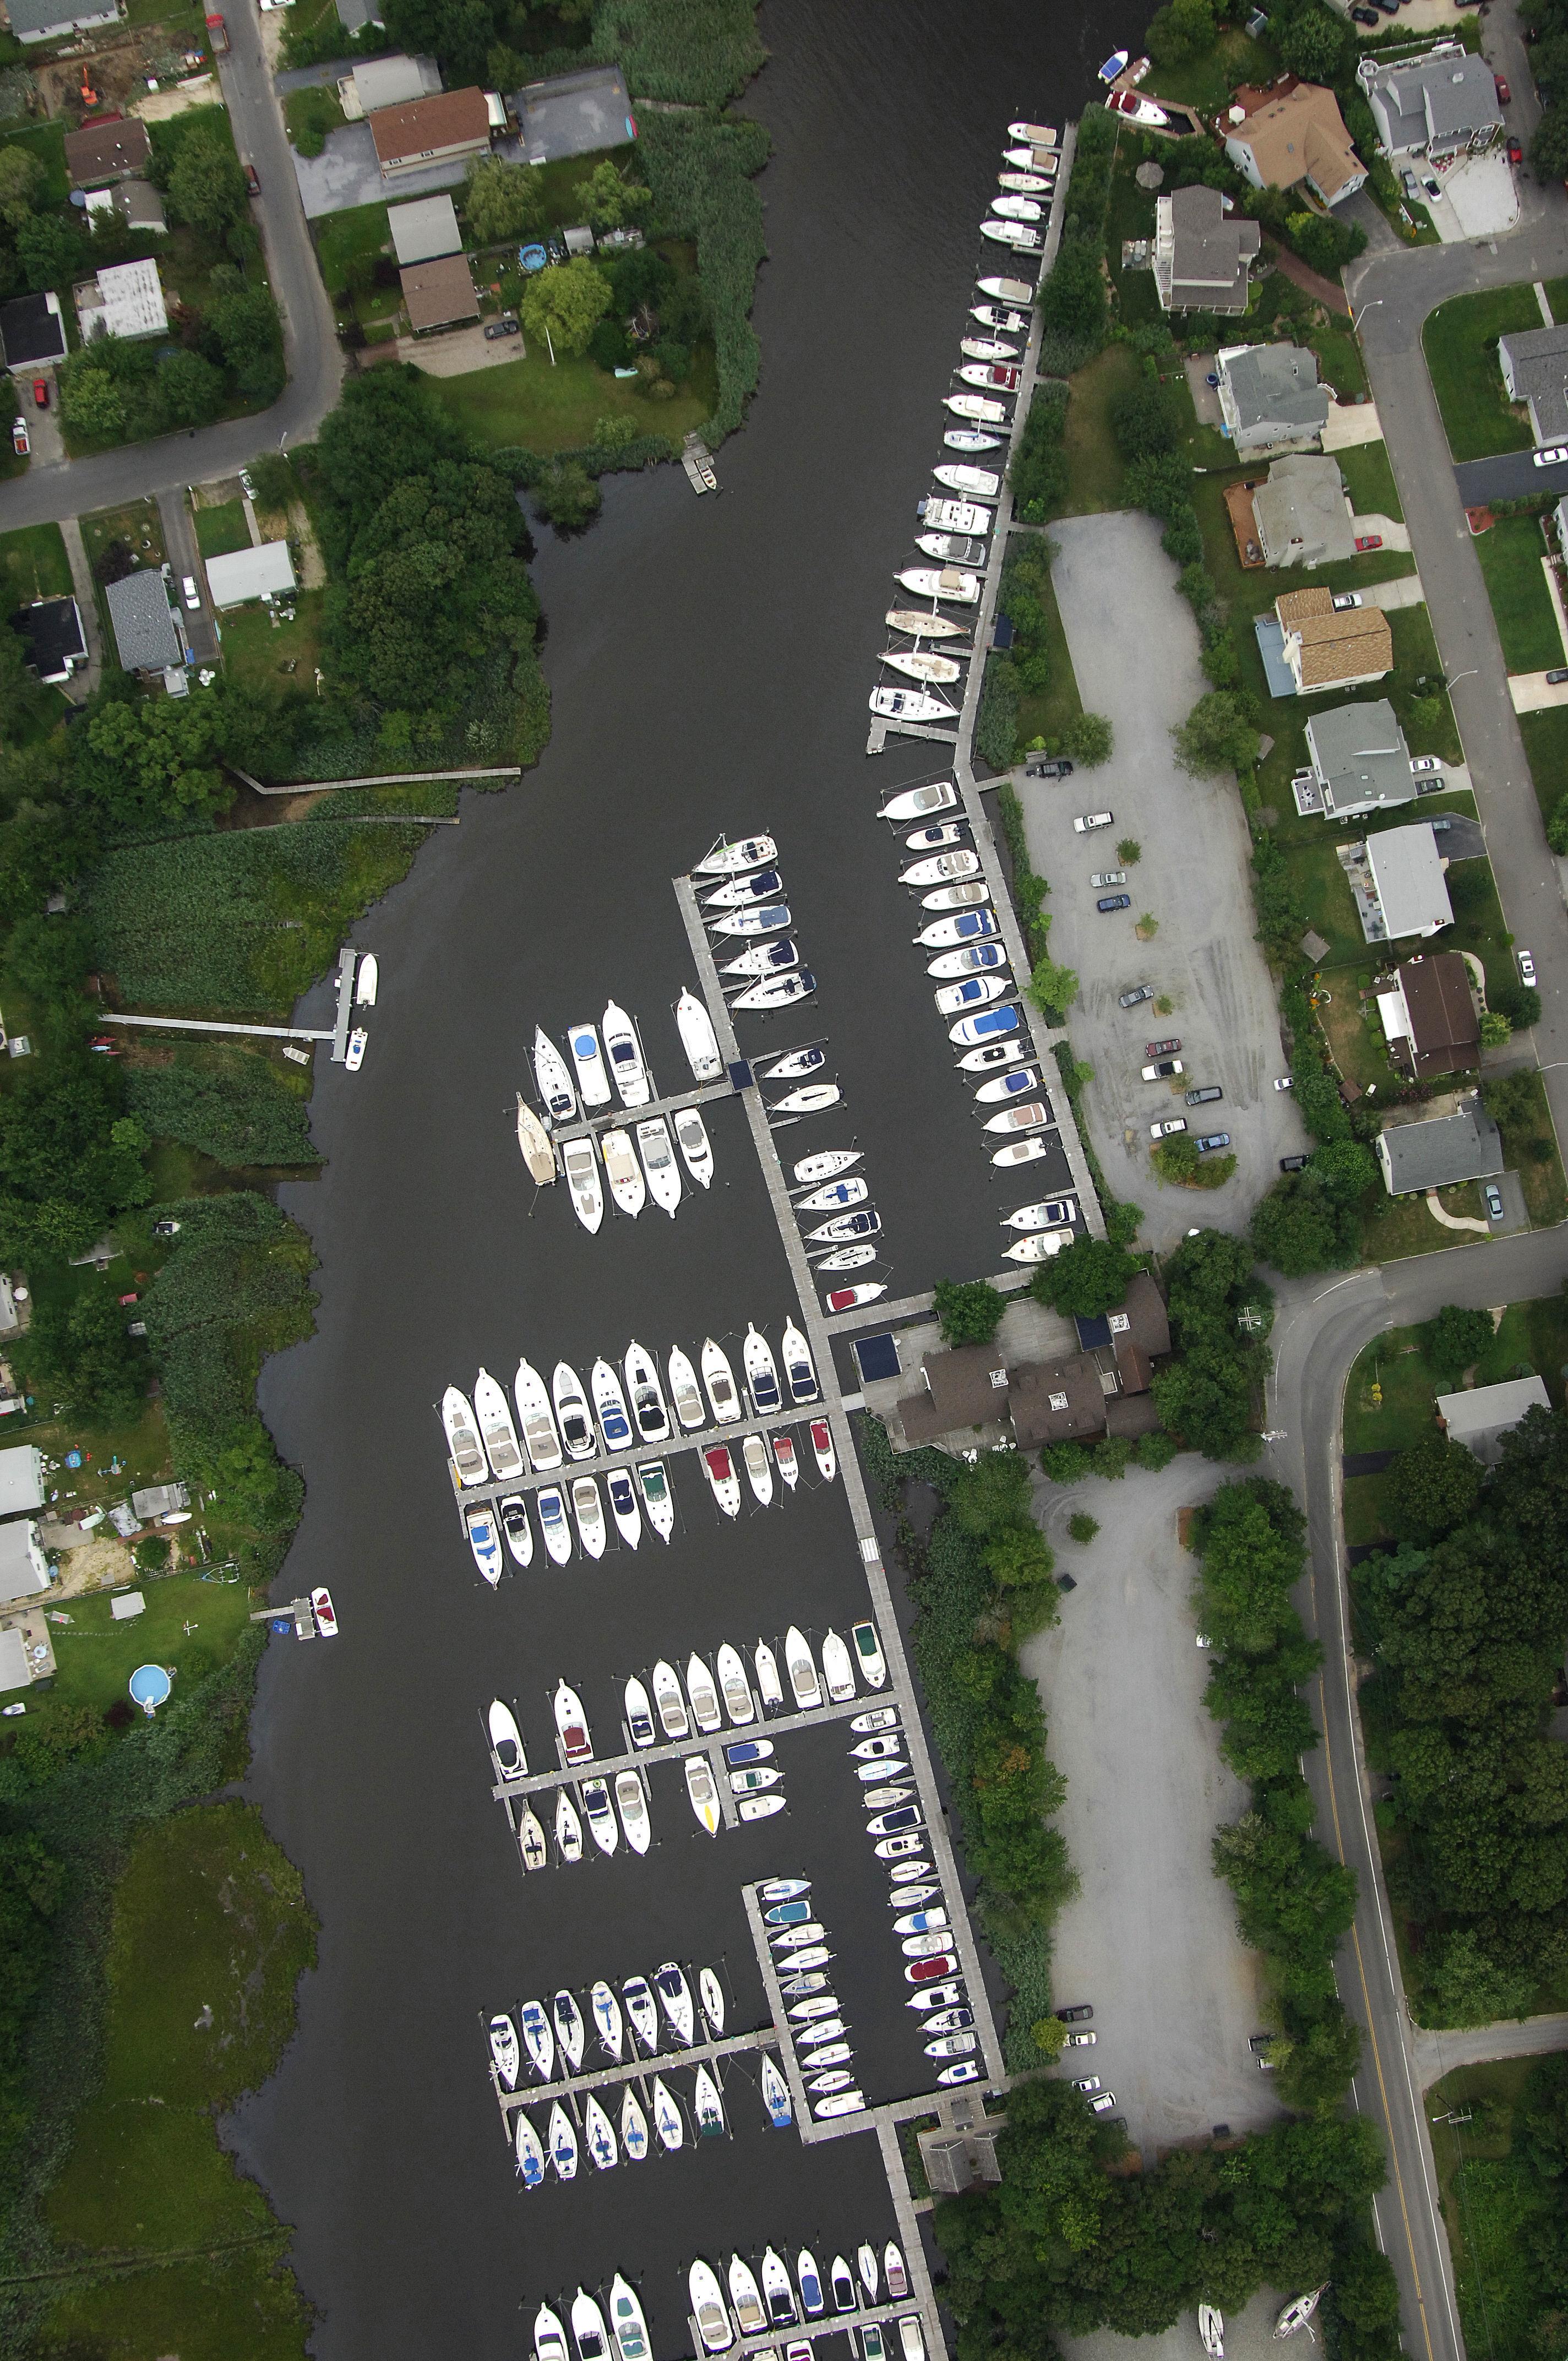 Dillon S Creek Marina Island Heights Nj